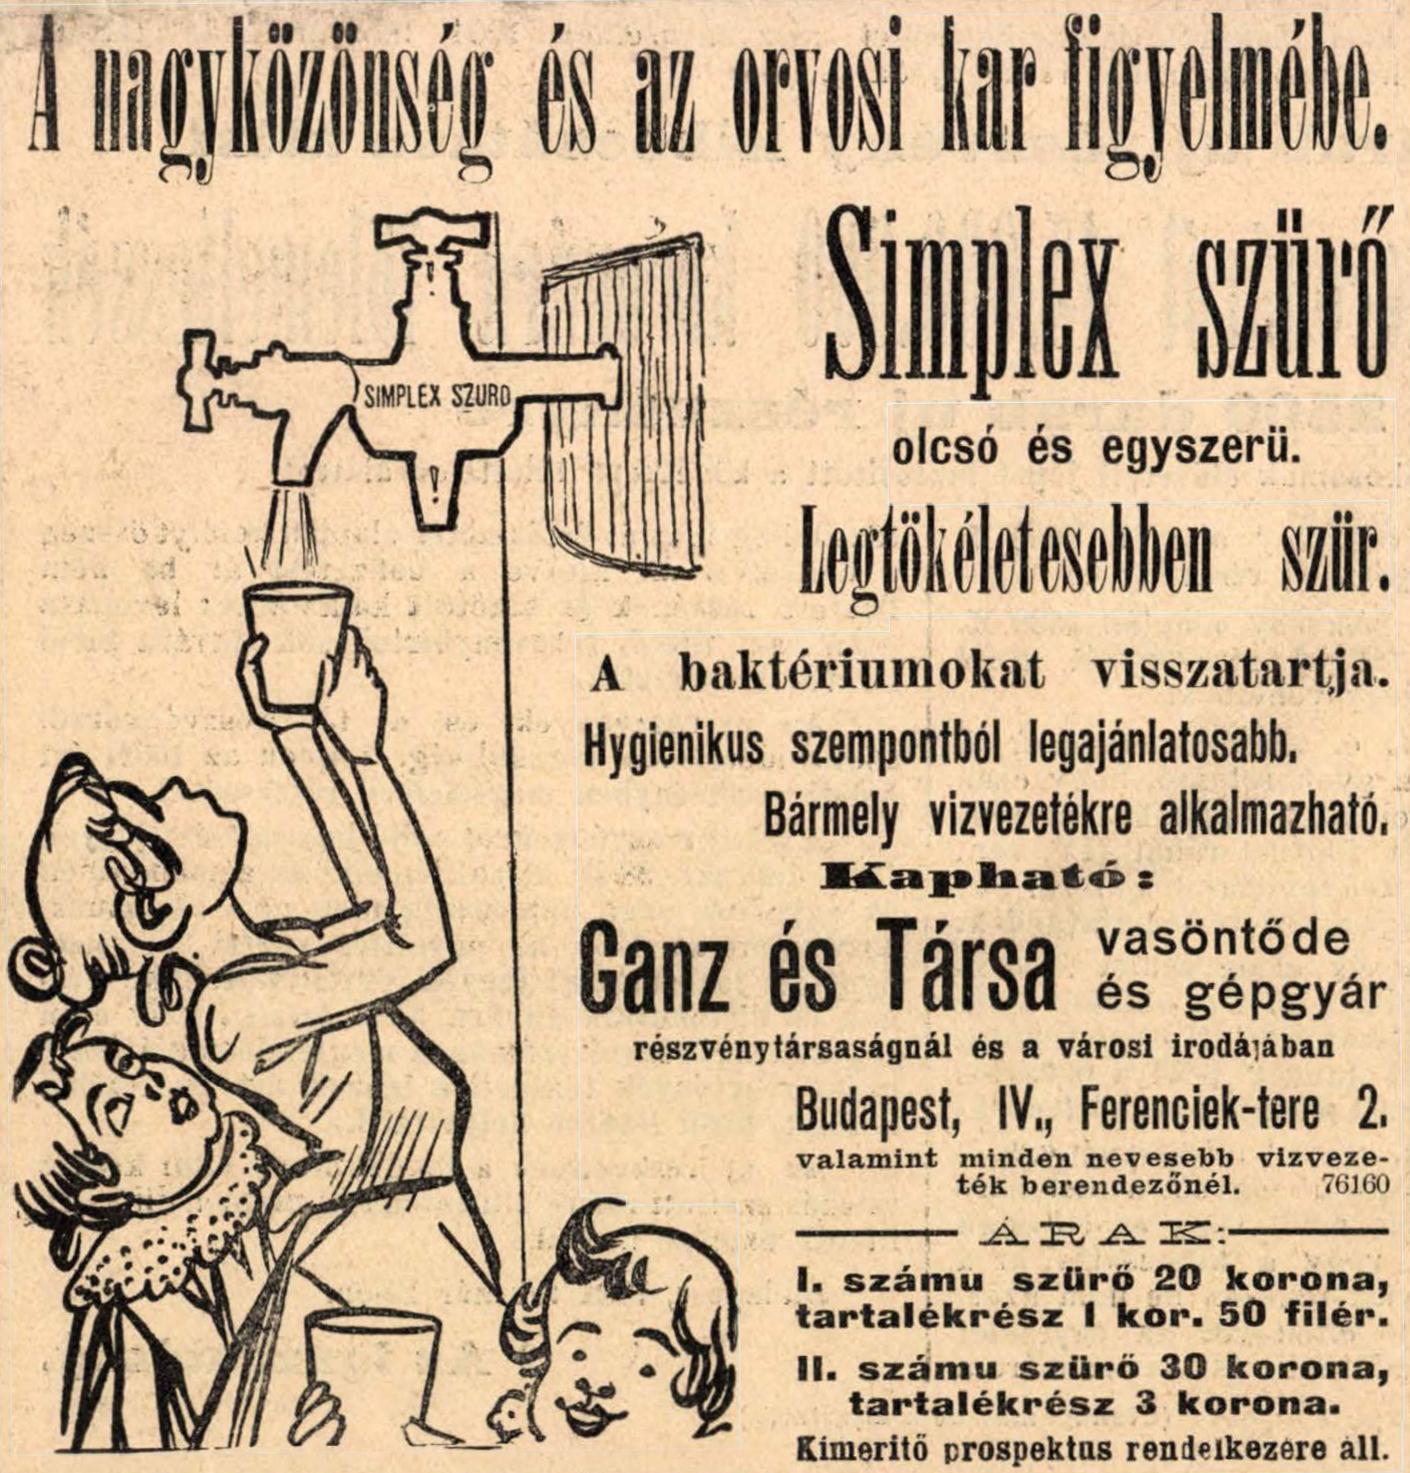 simplex-szuro2.jpg